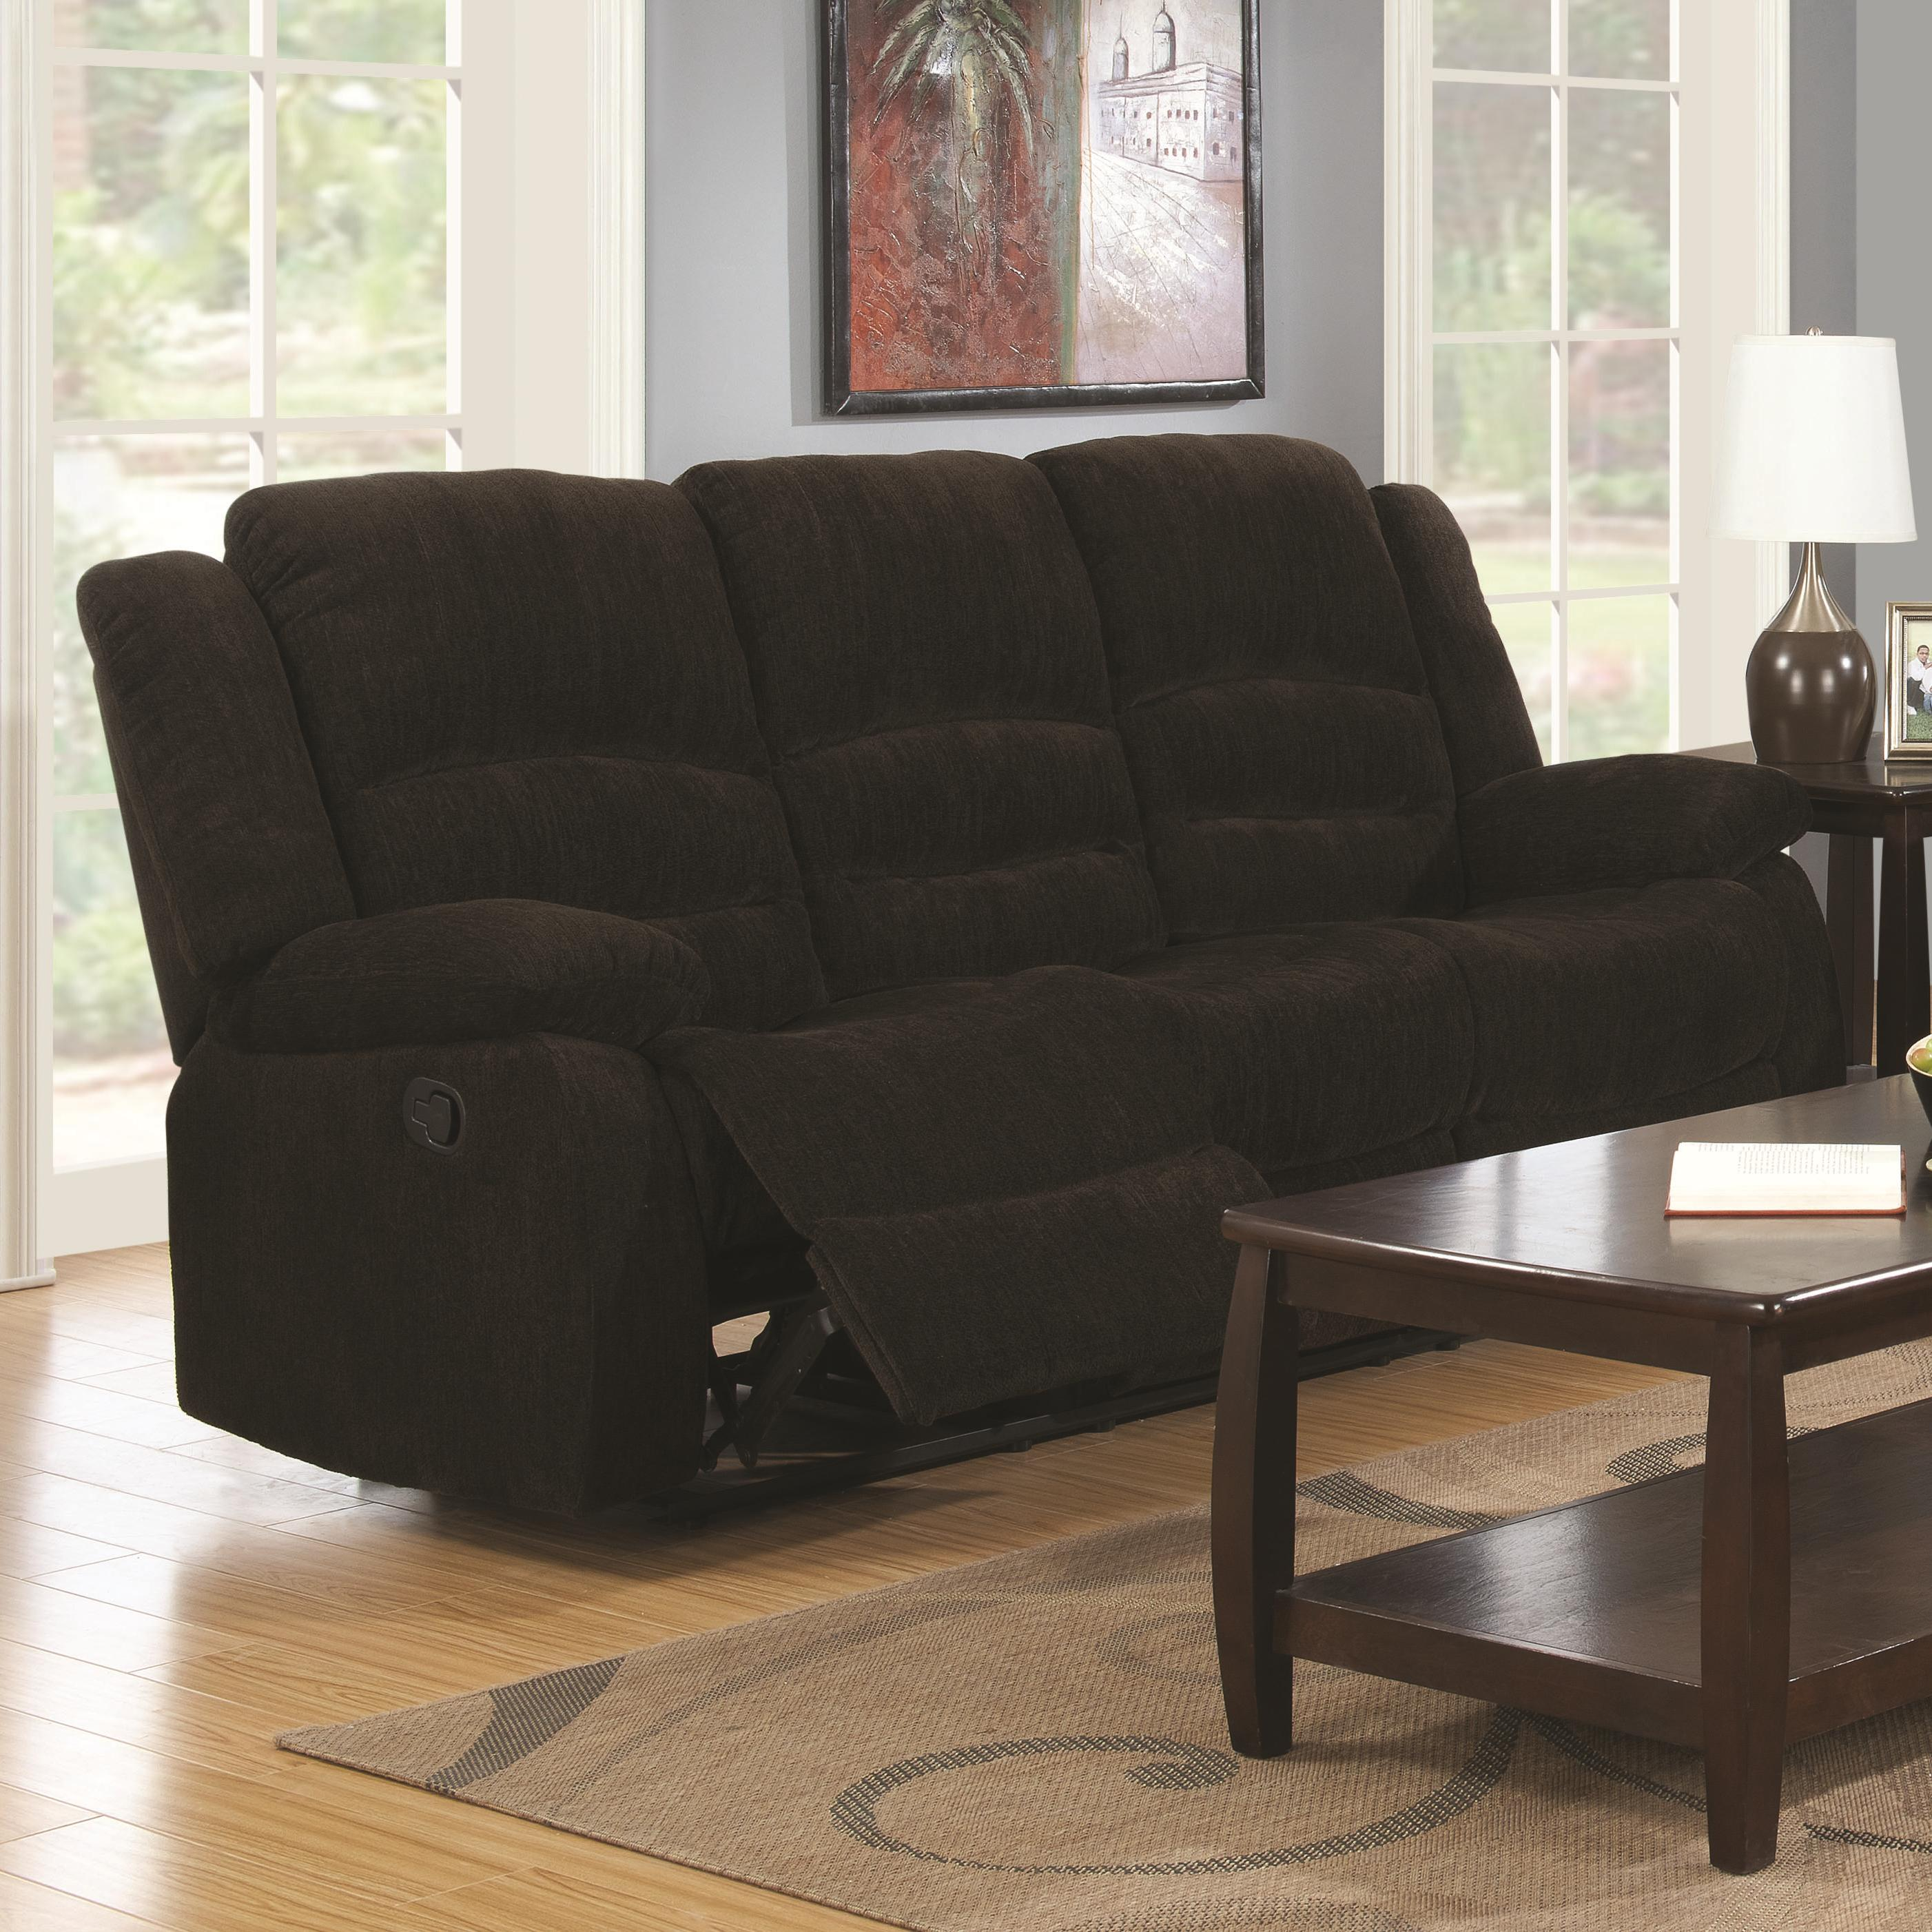 Coaster Gordon Casual Reclining Sofa Rife 39 S Home